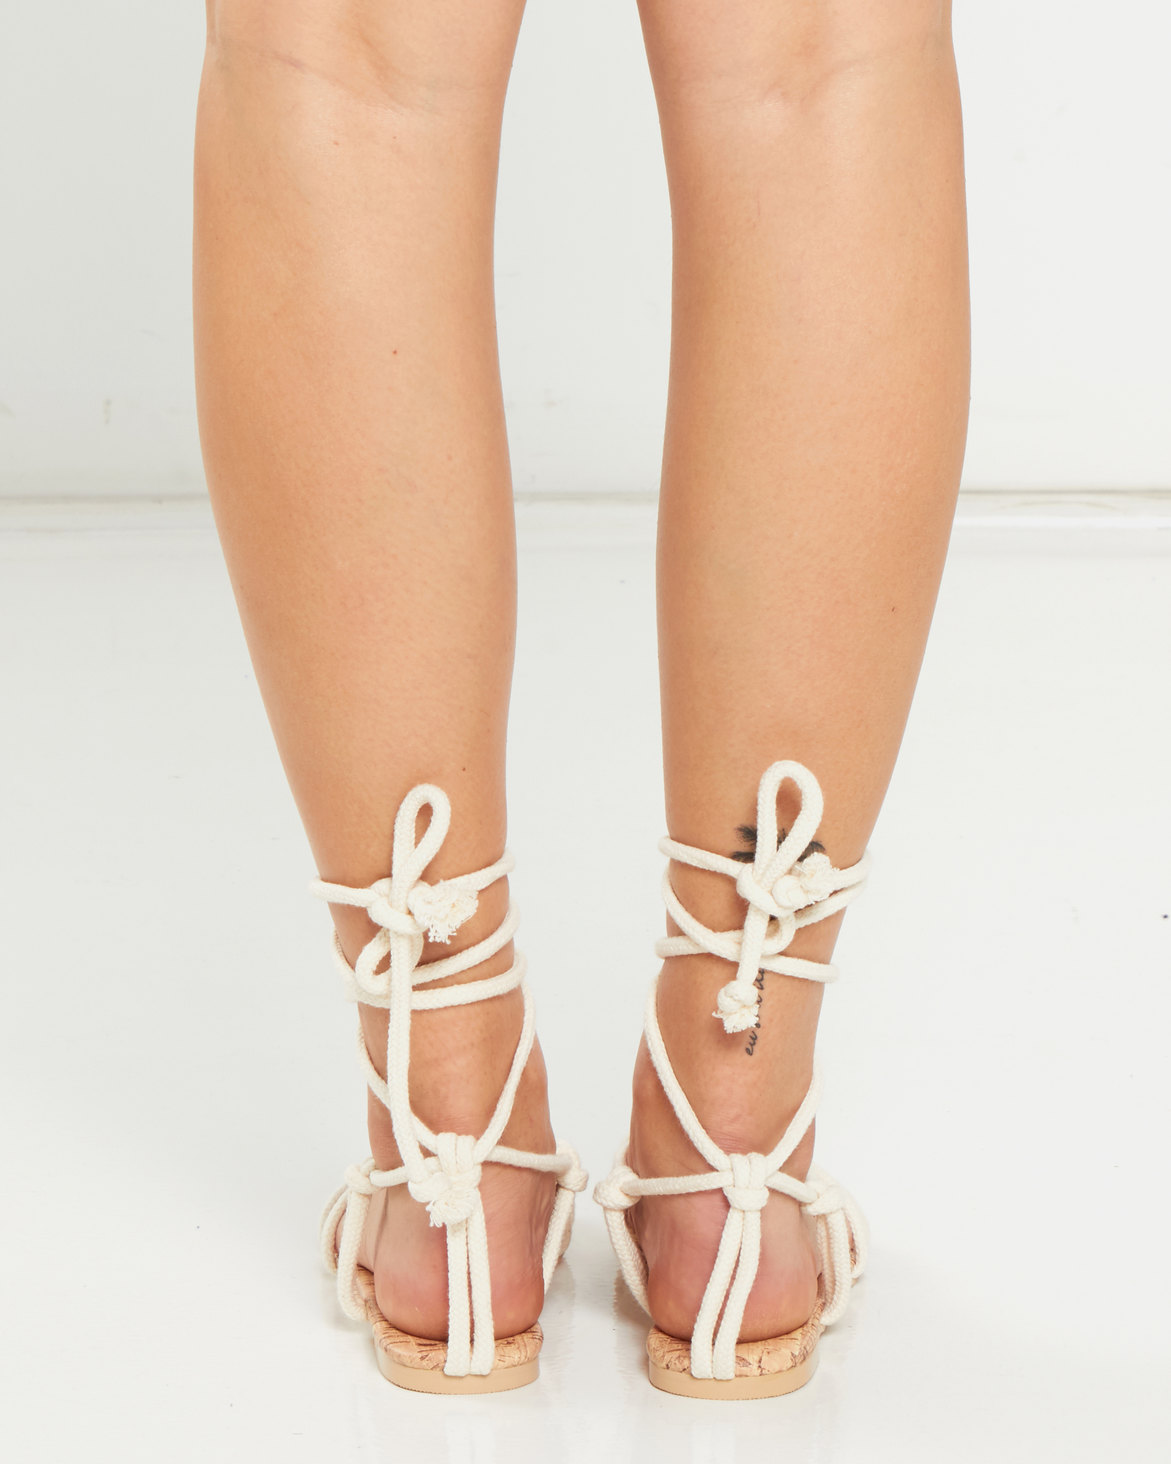 Shop Hailey Baldwins new shoe collection with Public